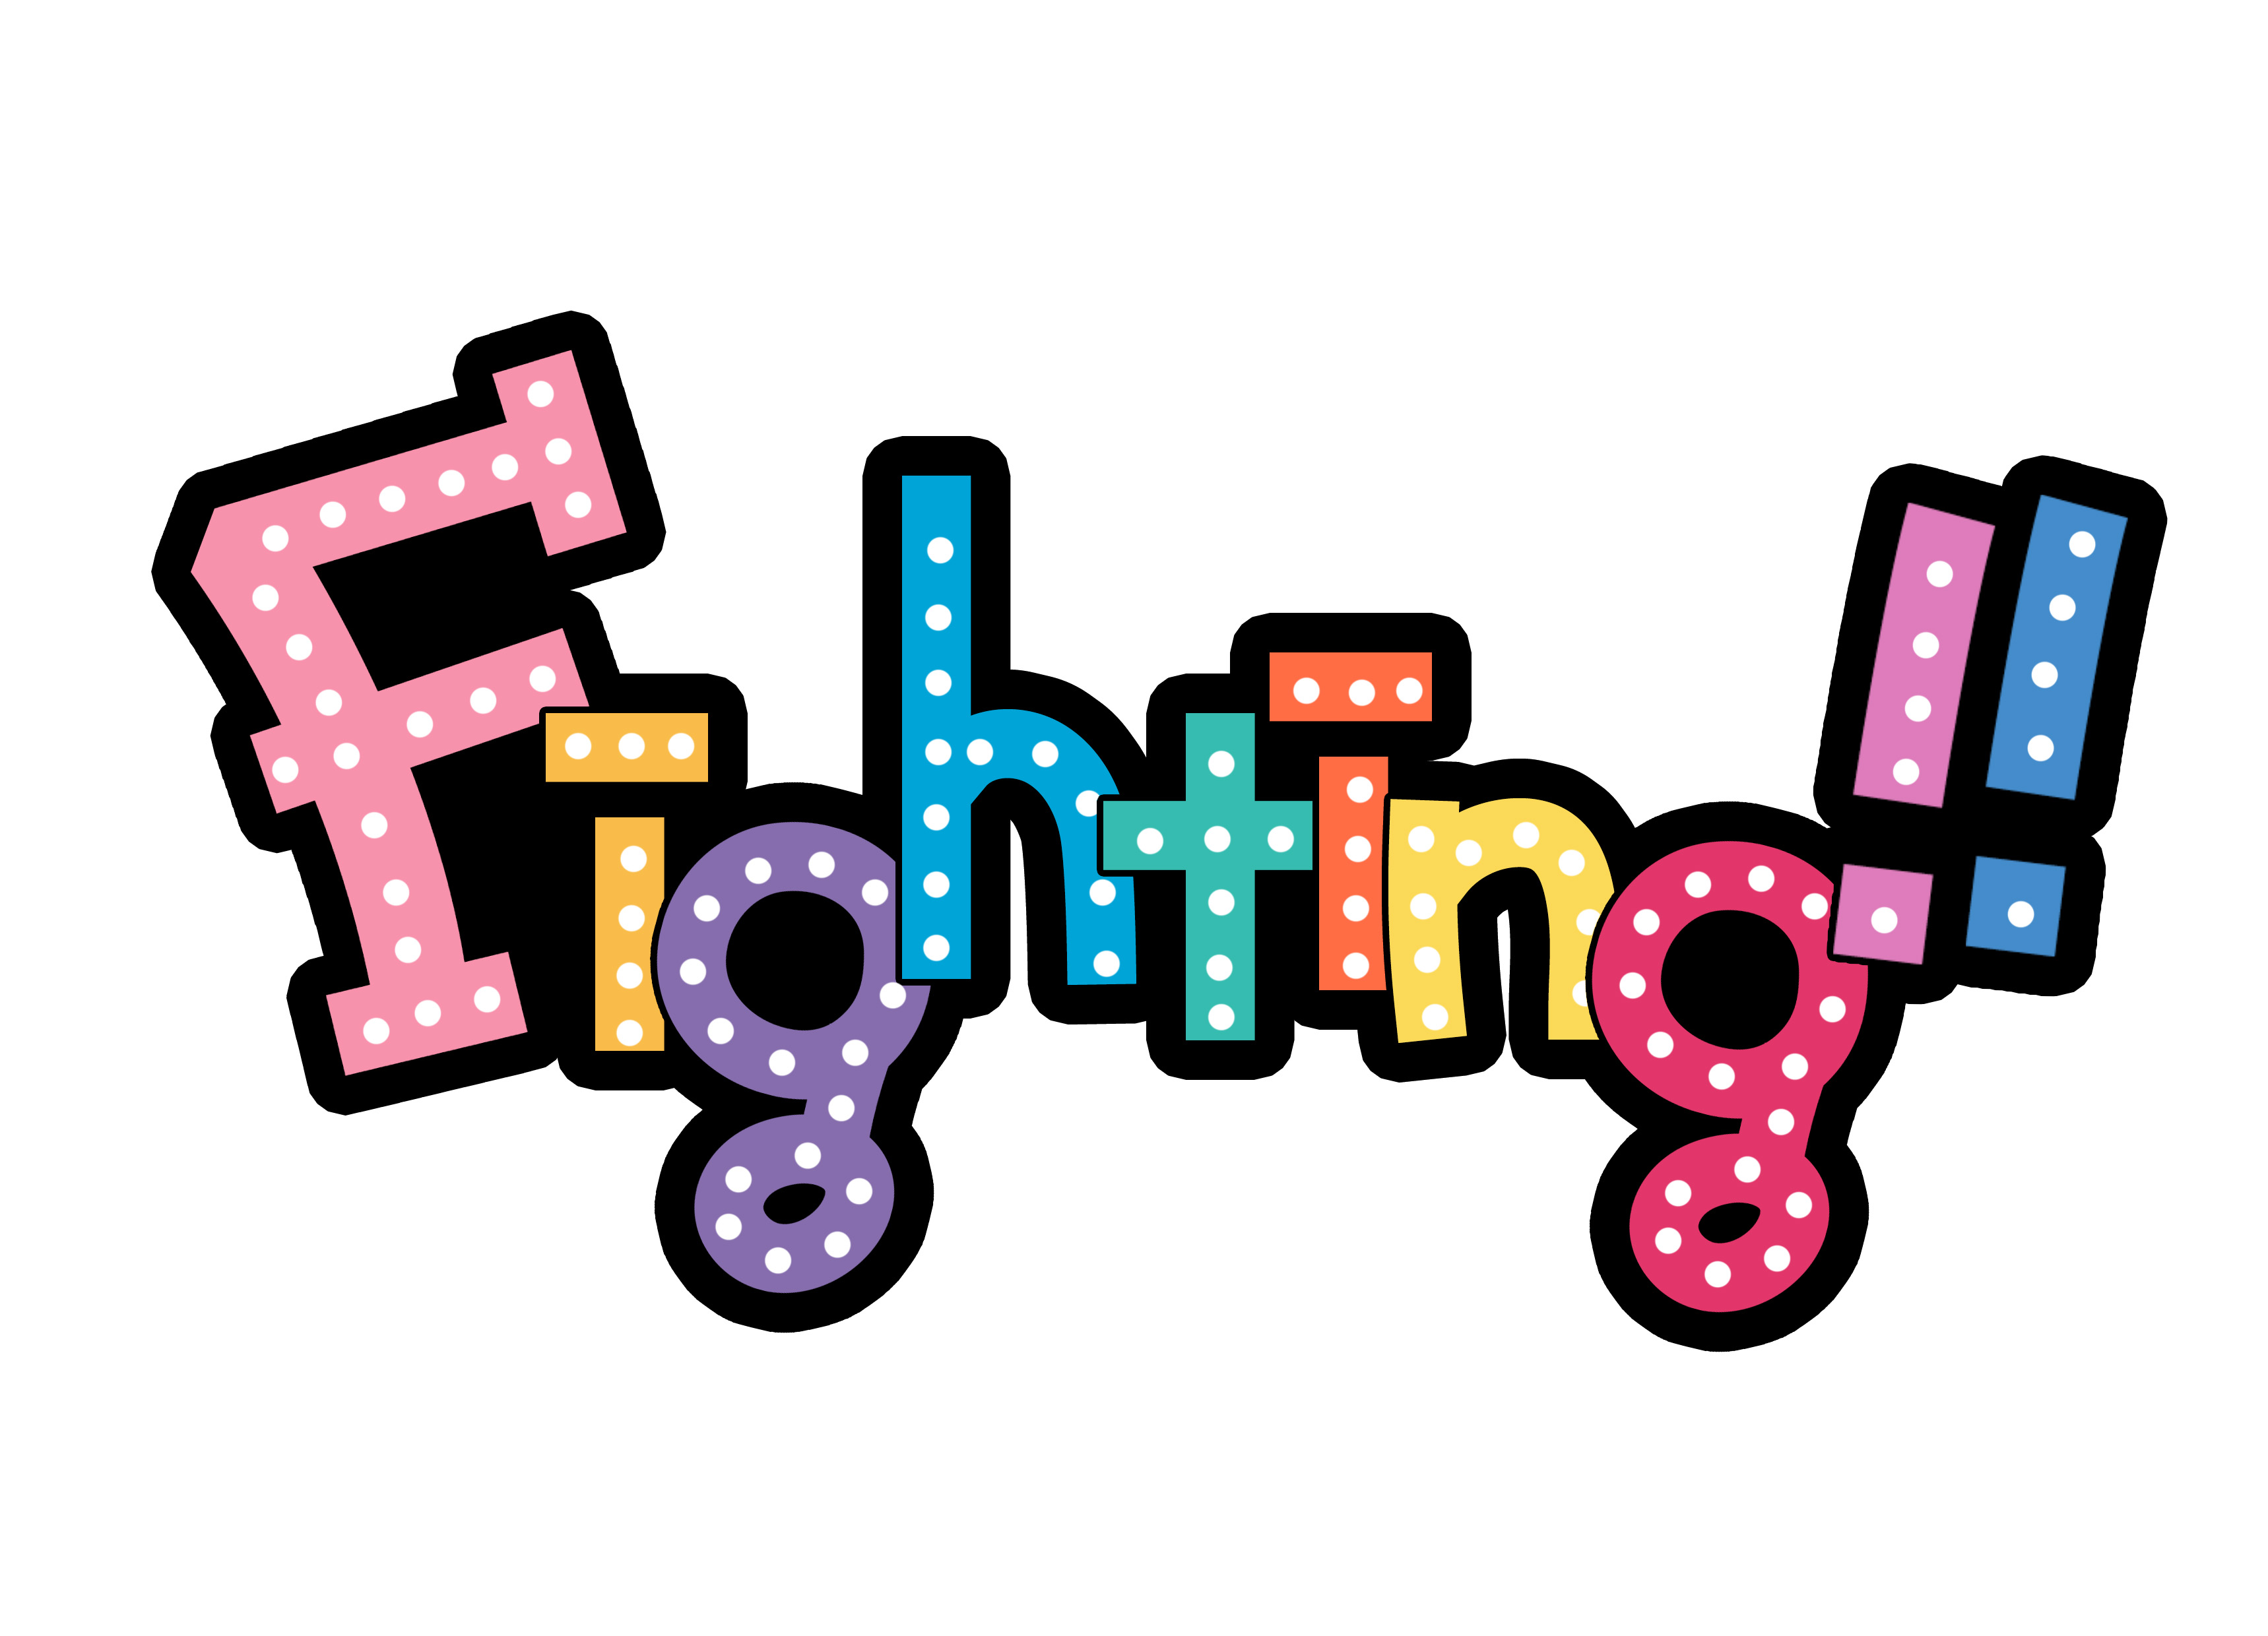 fighting(땡땡이)02